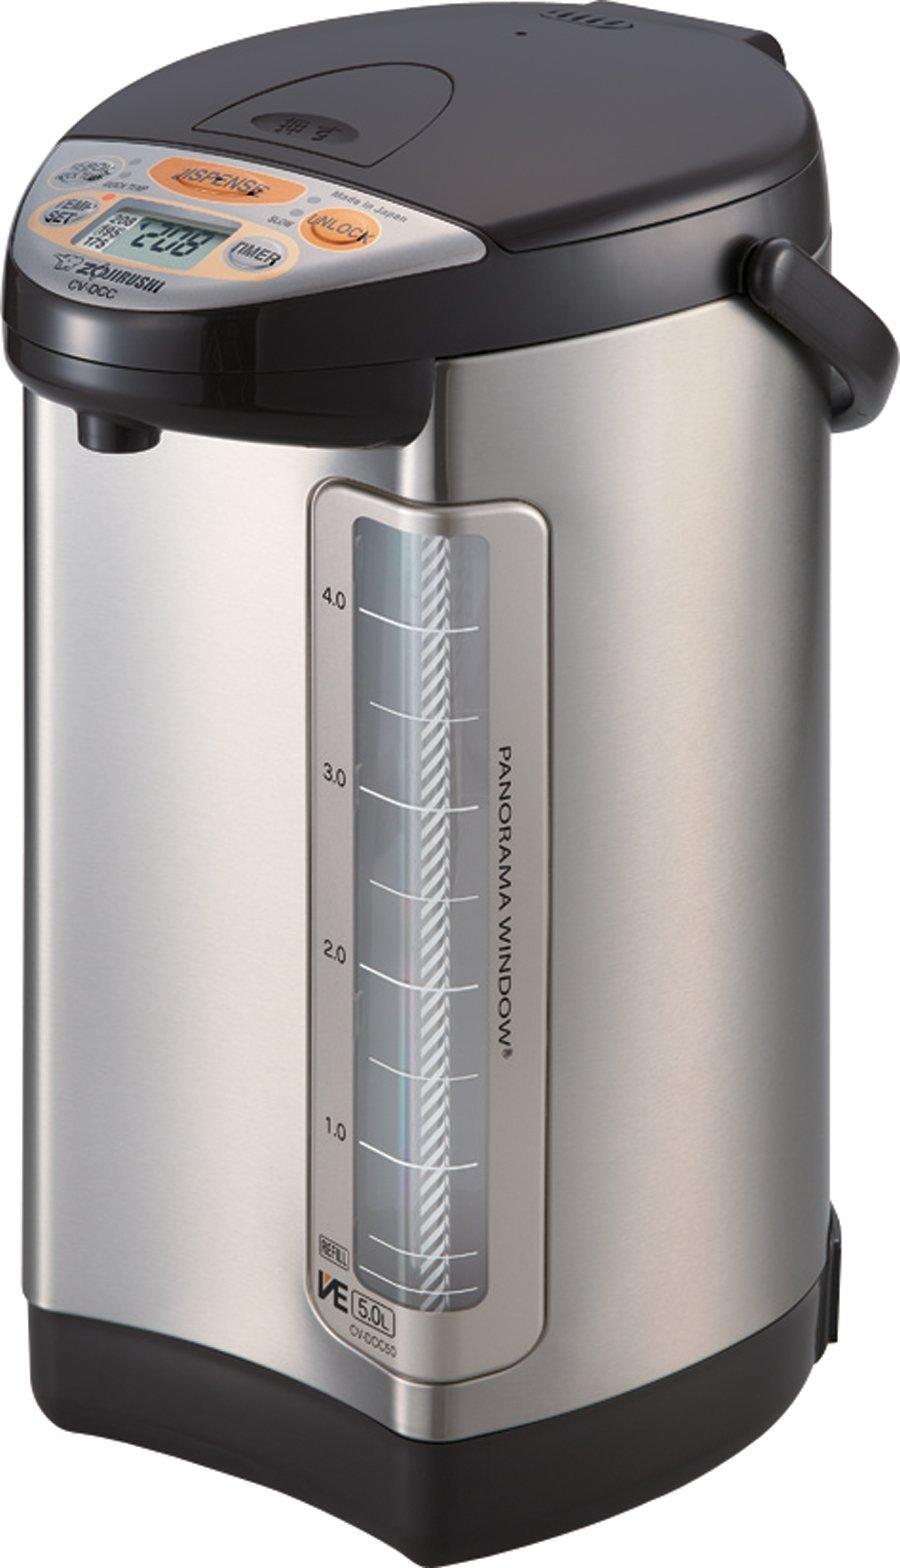 Zojirushi 586362-CV-DCC50XT America Corporation Ve Hybrid Water Boiler And Warmer, 5-Liter, Stainless Dark Brown (Renewed) by Zojirushi